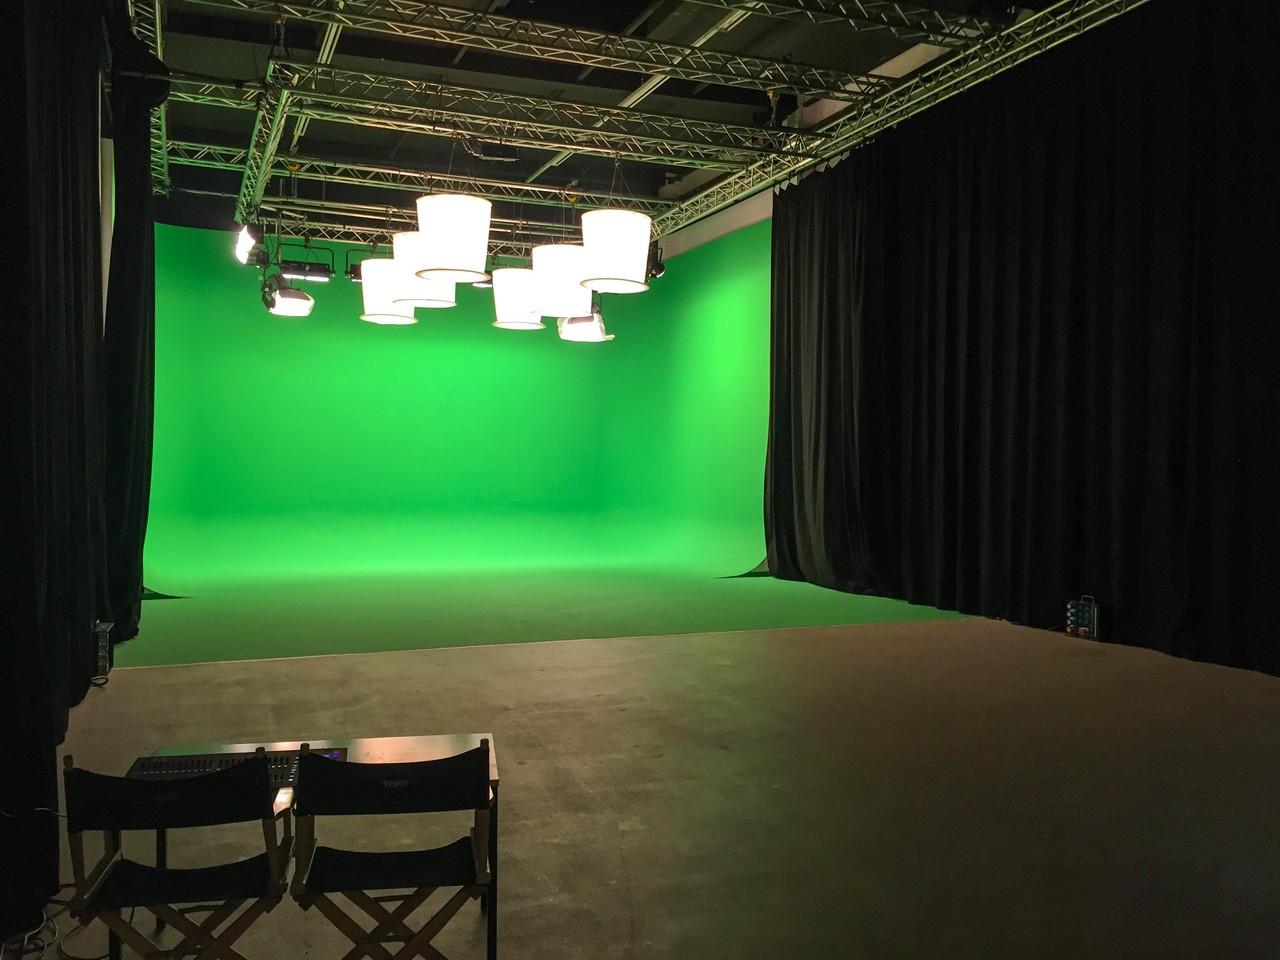 TMT Filmstudio Studio 1 in München mit Green Box